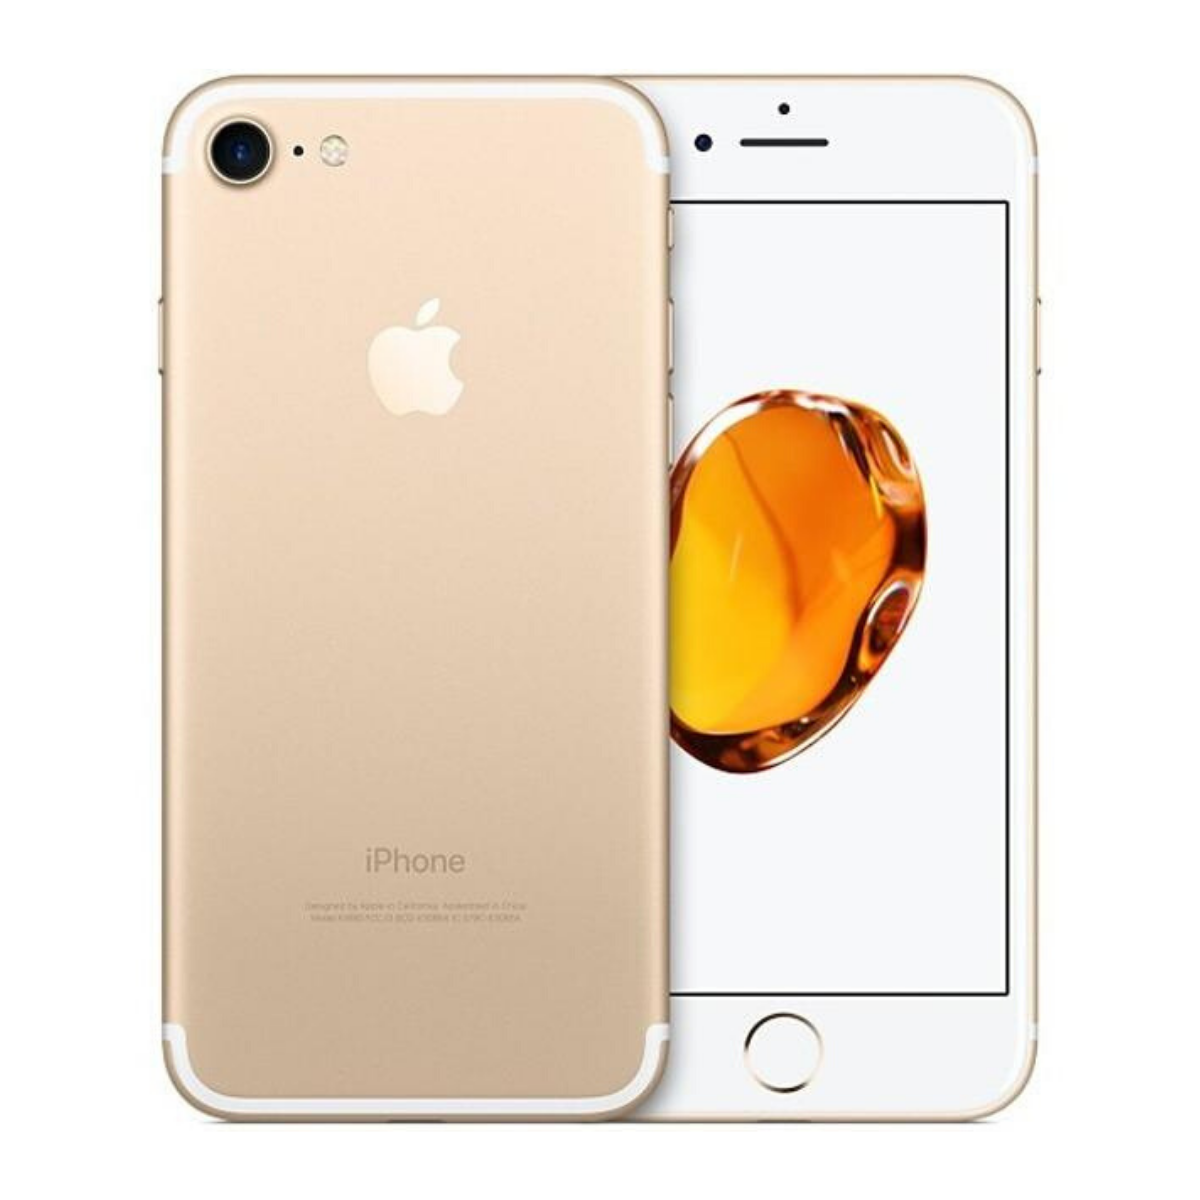 Sim Free iPhone 7 128GB Unlocked Mobile Phone - Gold